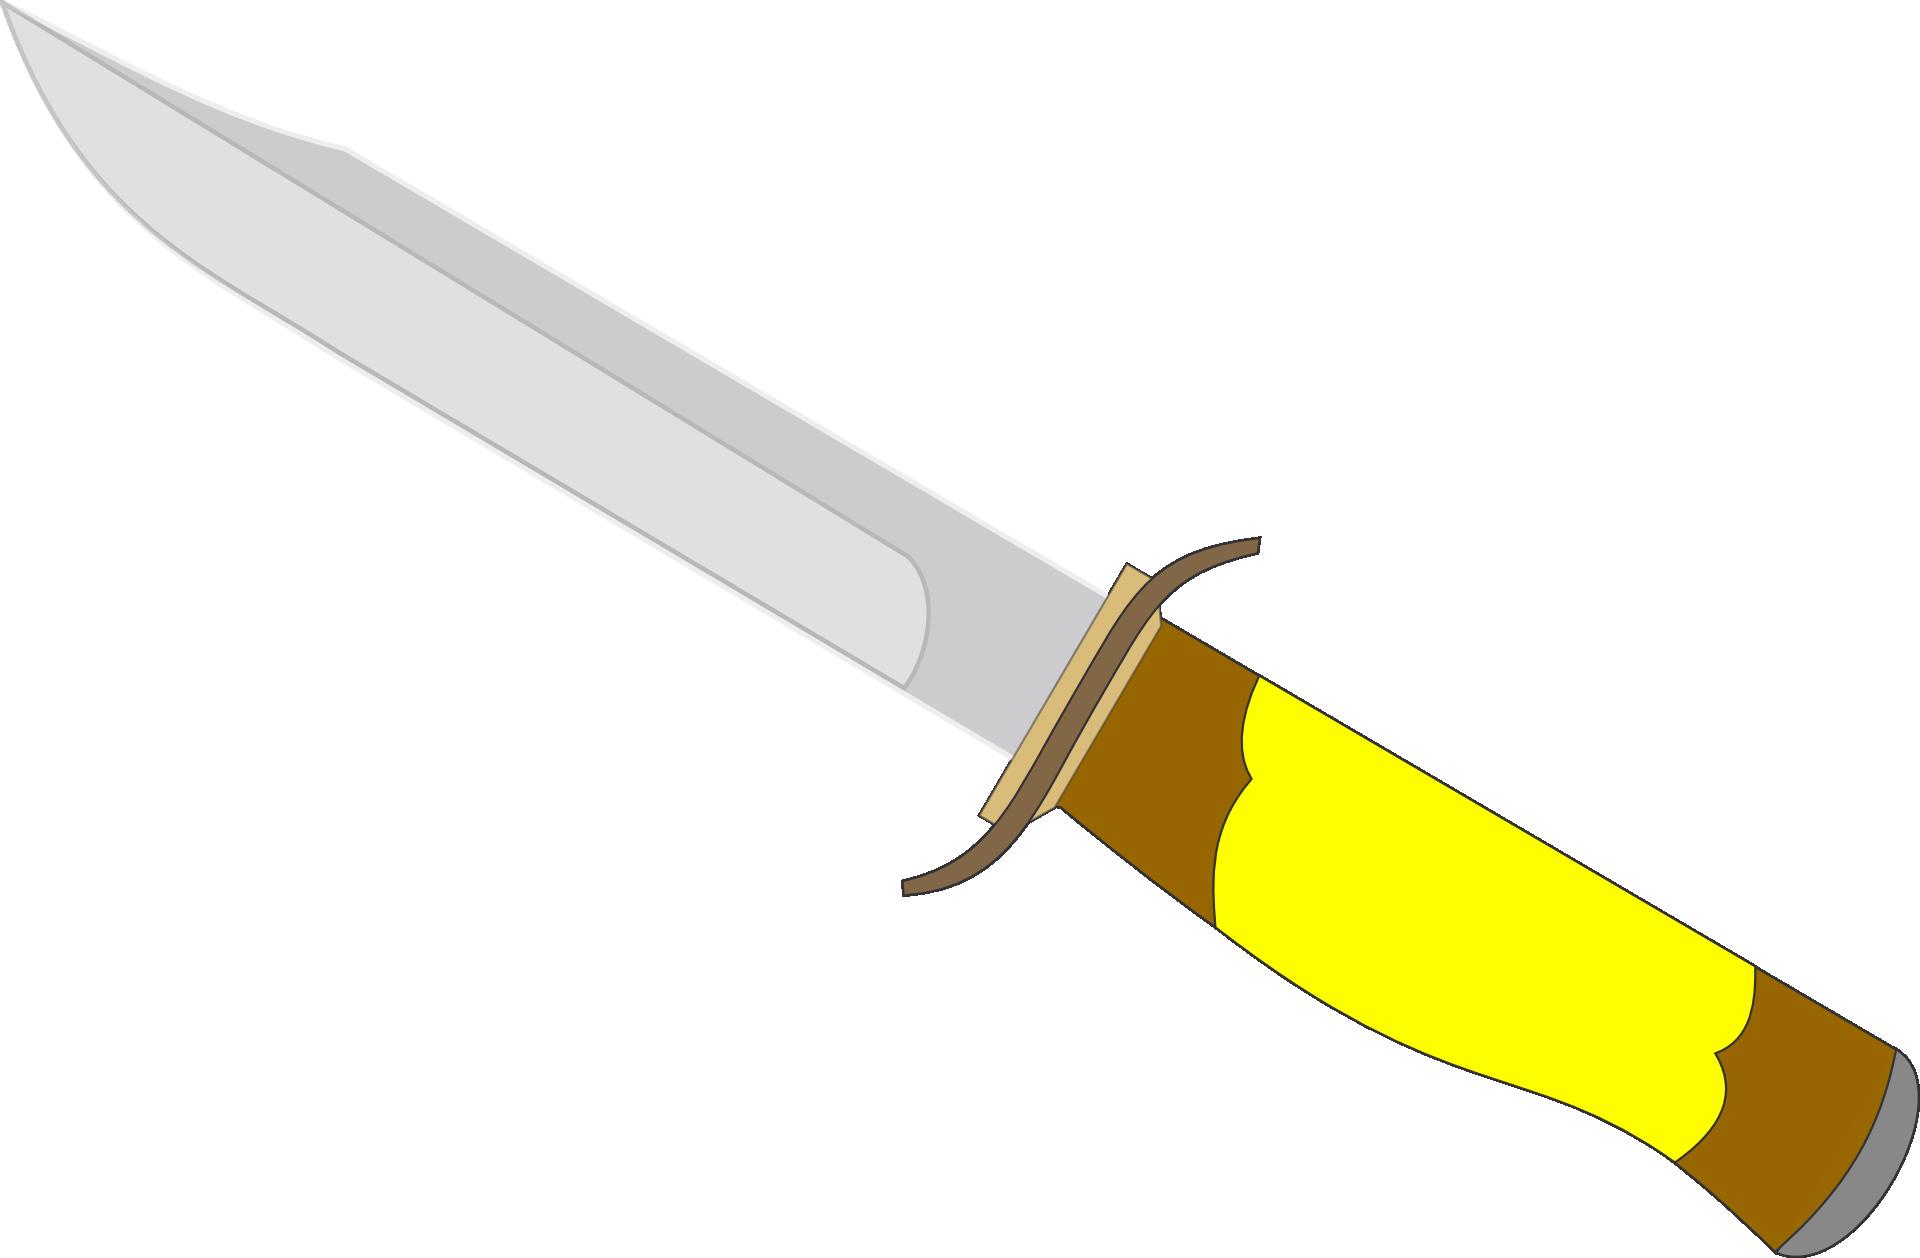 Knife clipart sharp knife Clipart Knife Free (4566) Knife